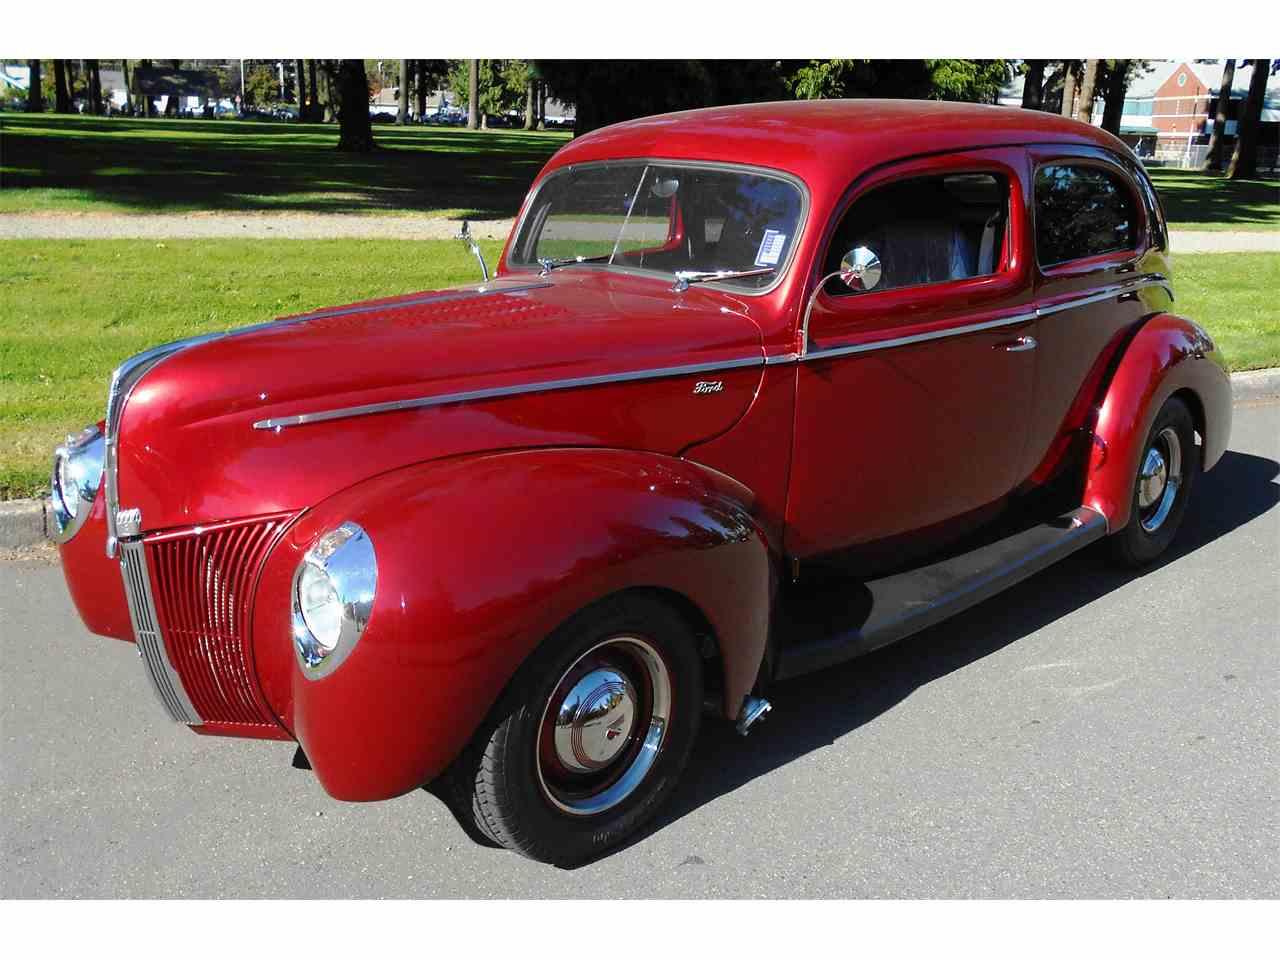 1940 ford 2 dr sedan for sale cc 902311 for 1948 austin devon 4 door